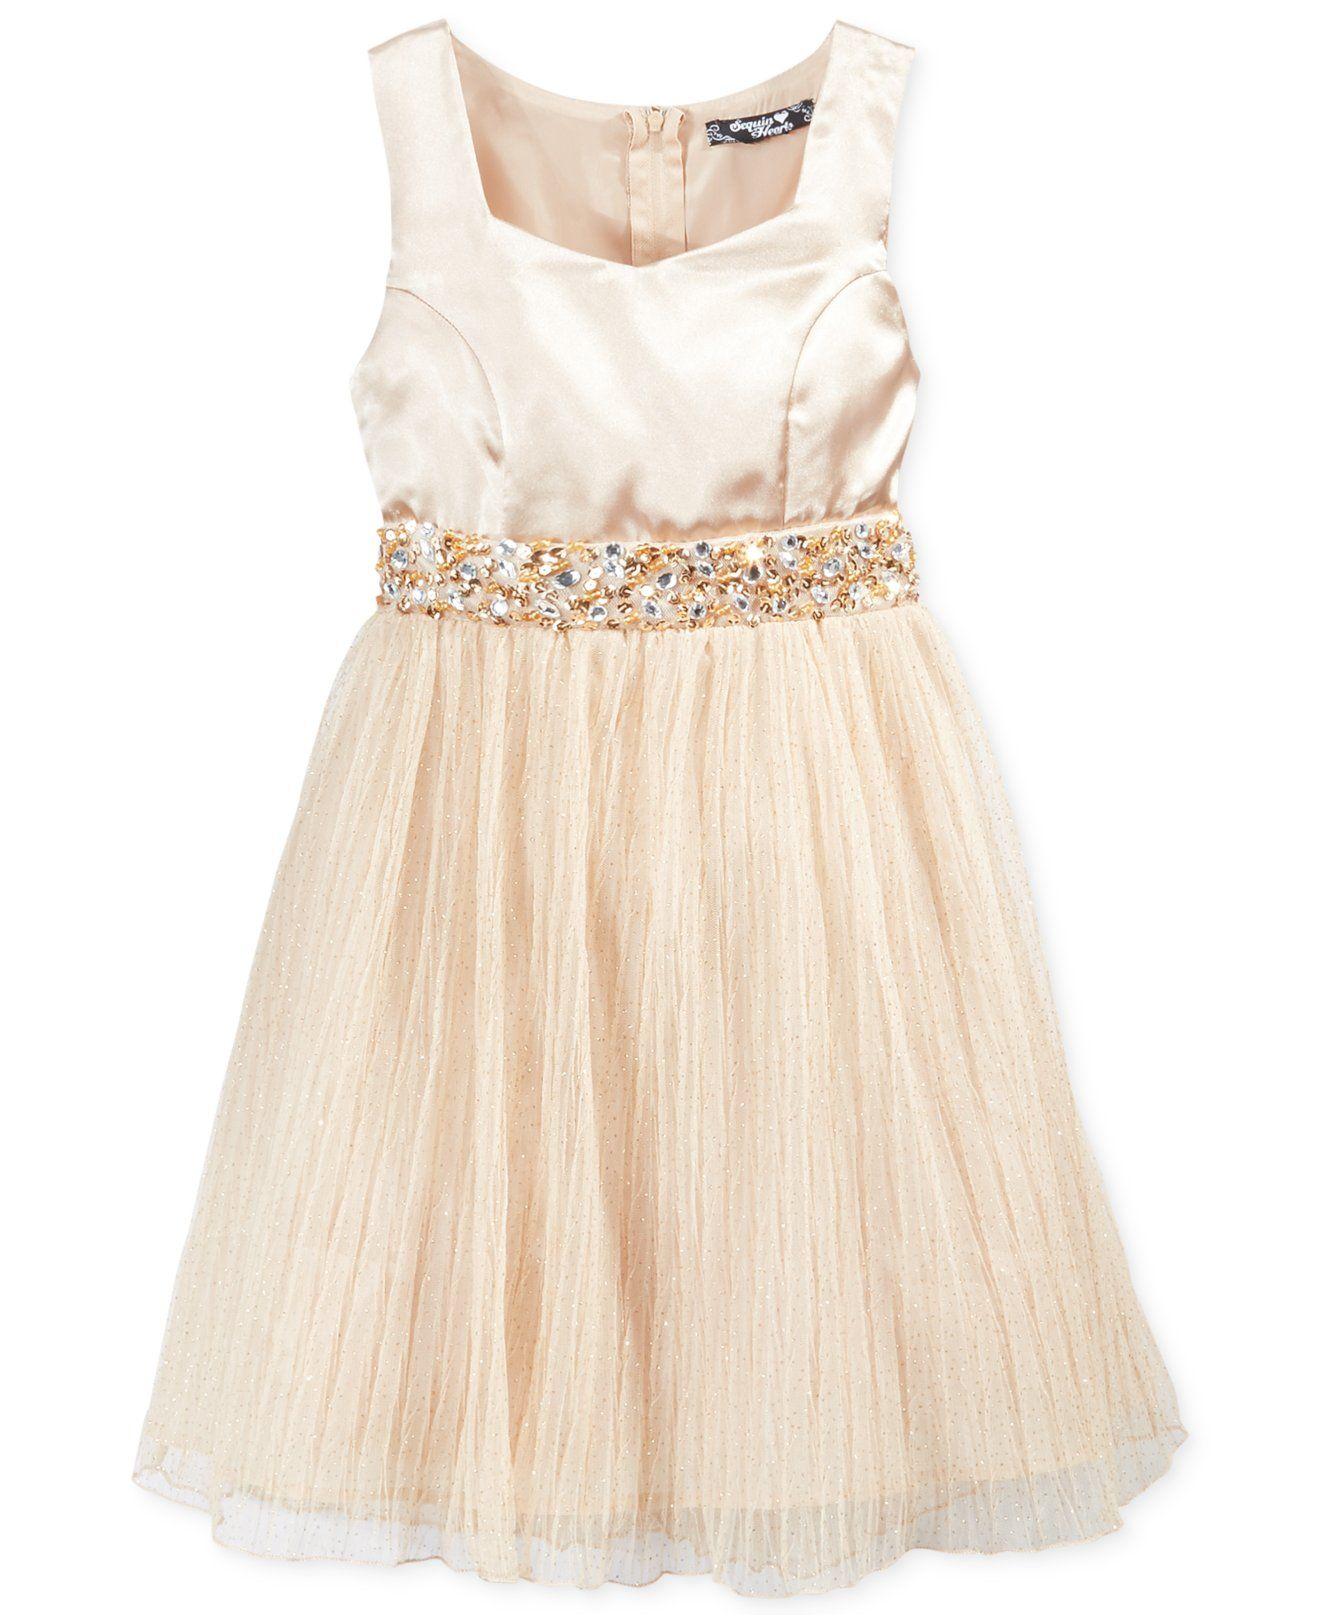 a147f8c10f9c7 Sequin Hearts Girls Dress, Girls Embellished-Waist Dress - Kids ...